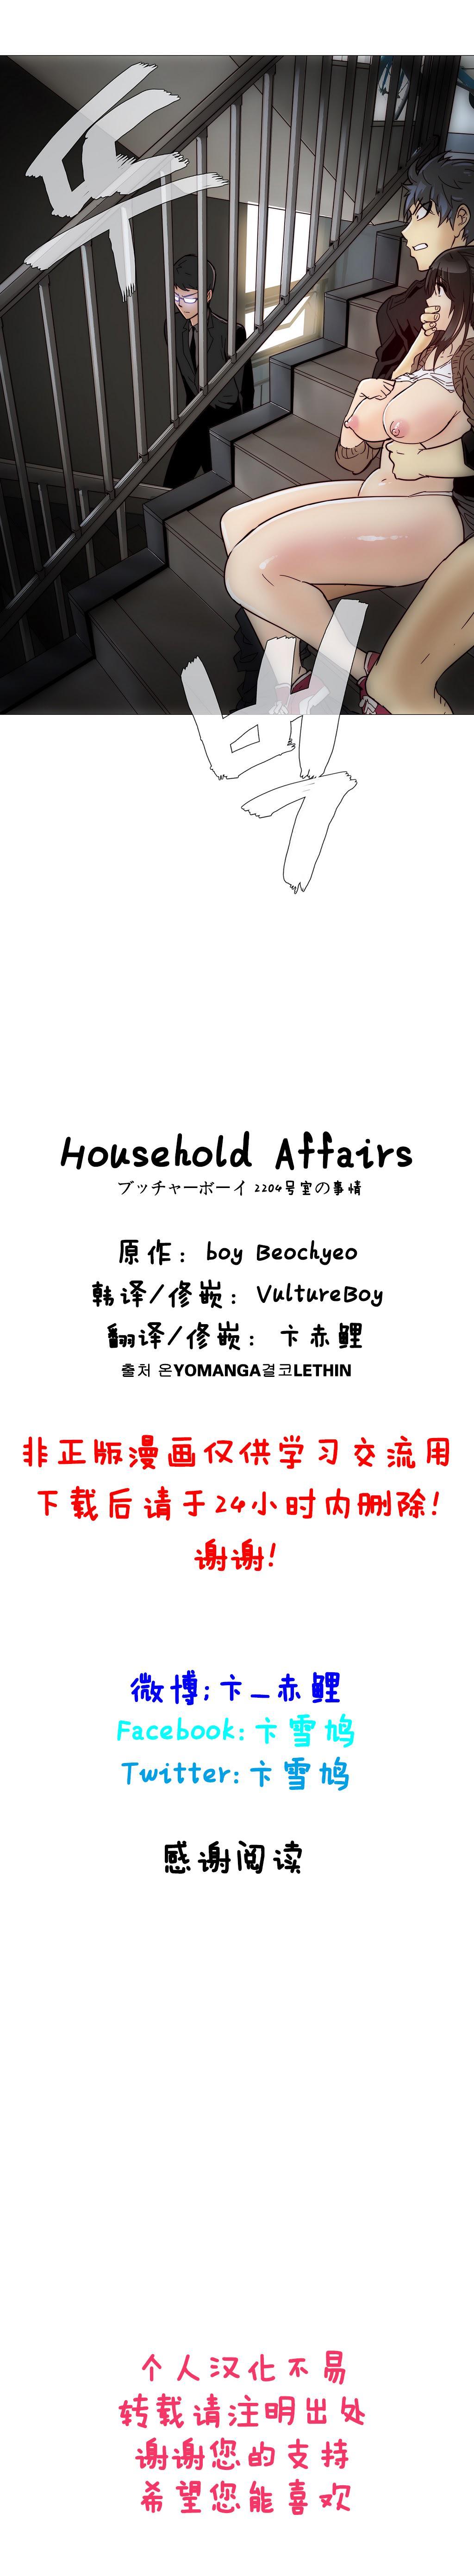 HouseHold Affairs 【卞赤鲤个人汉化】1~21话(持续更新中) 145